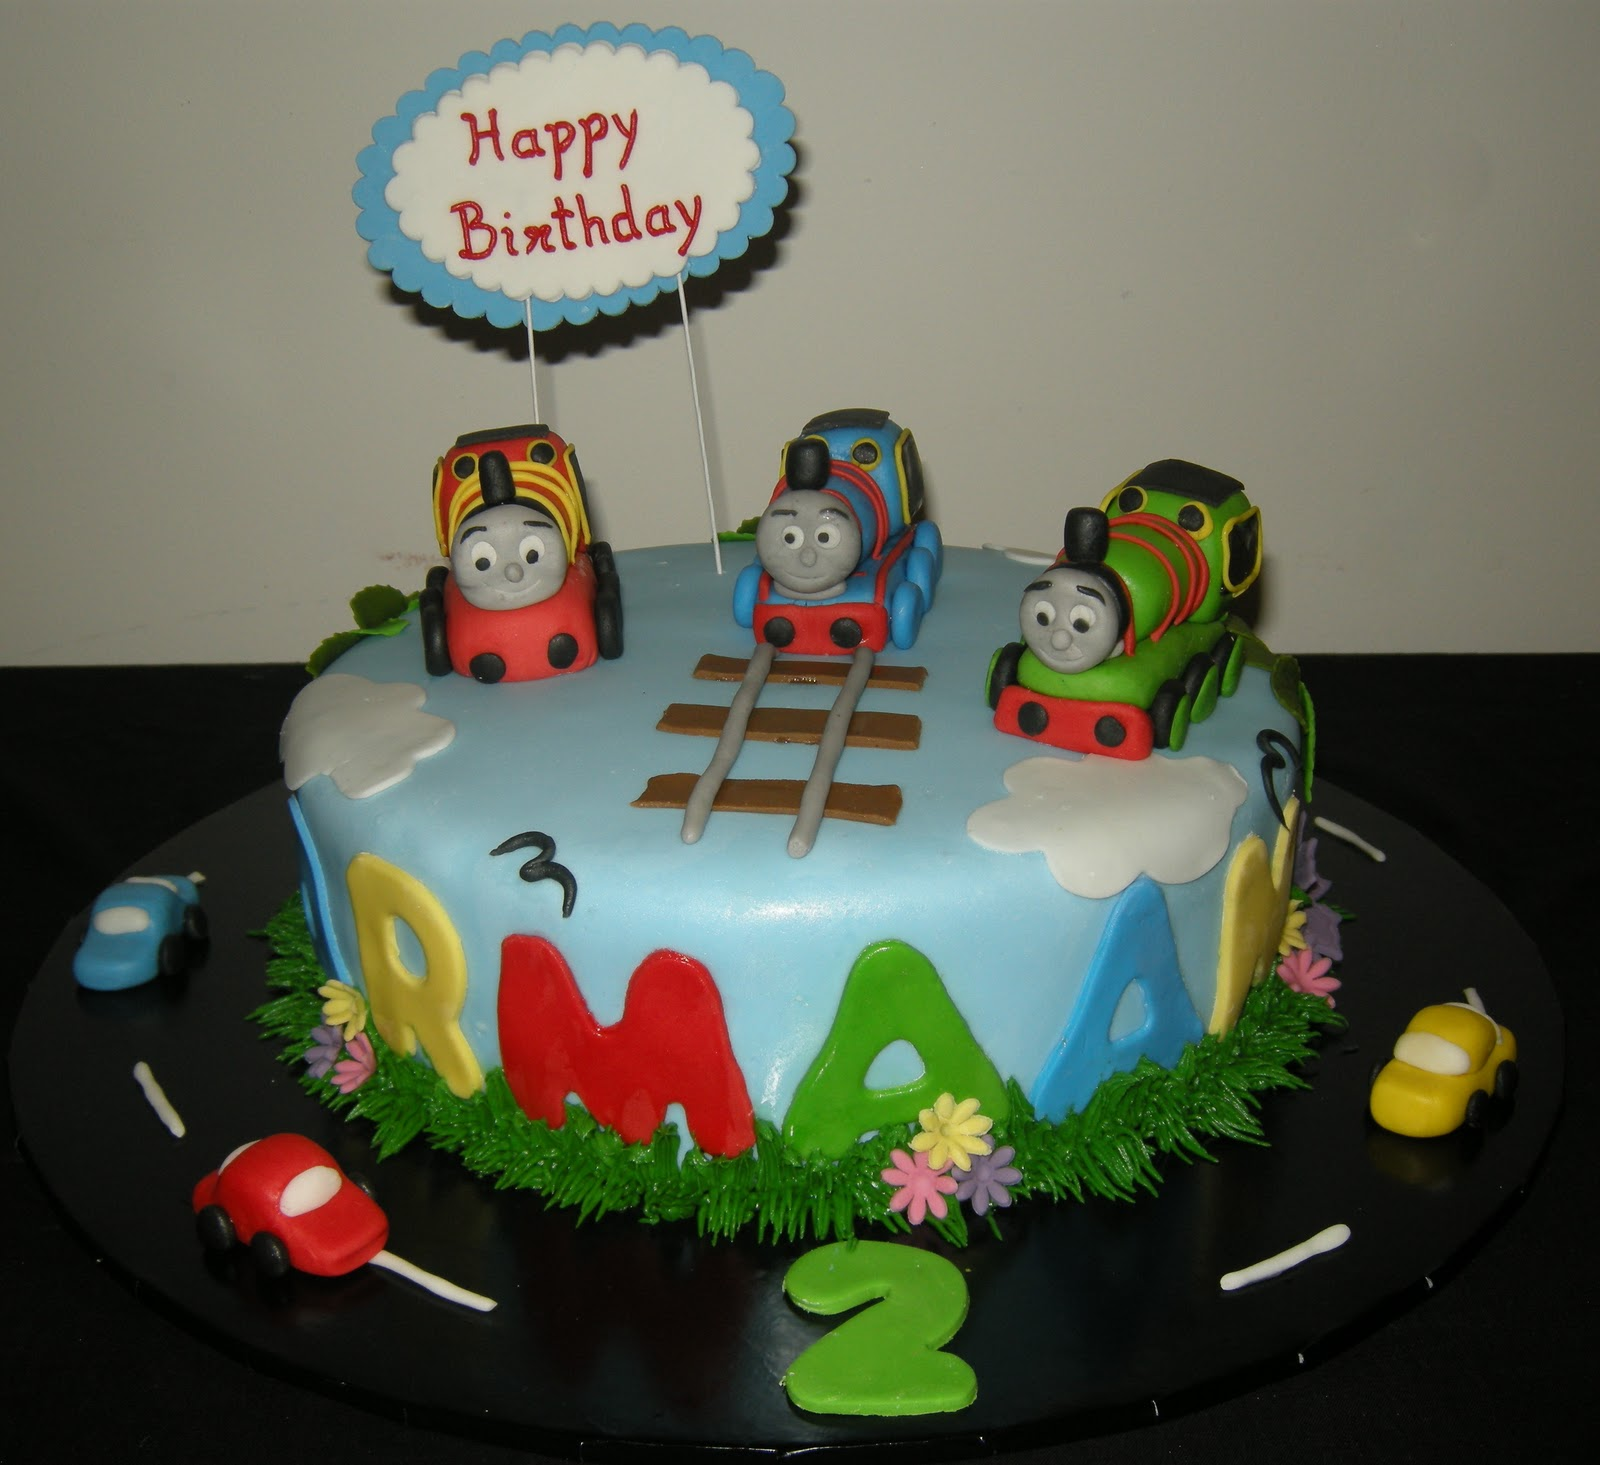 Harshi s Cakes & Bakes: Testimonials